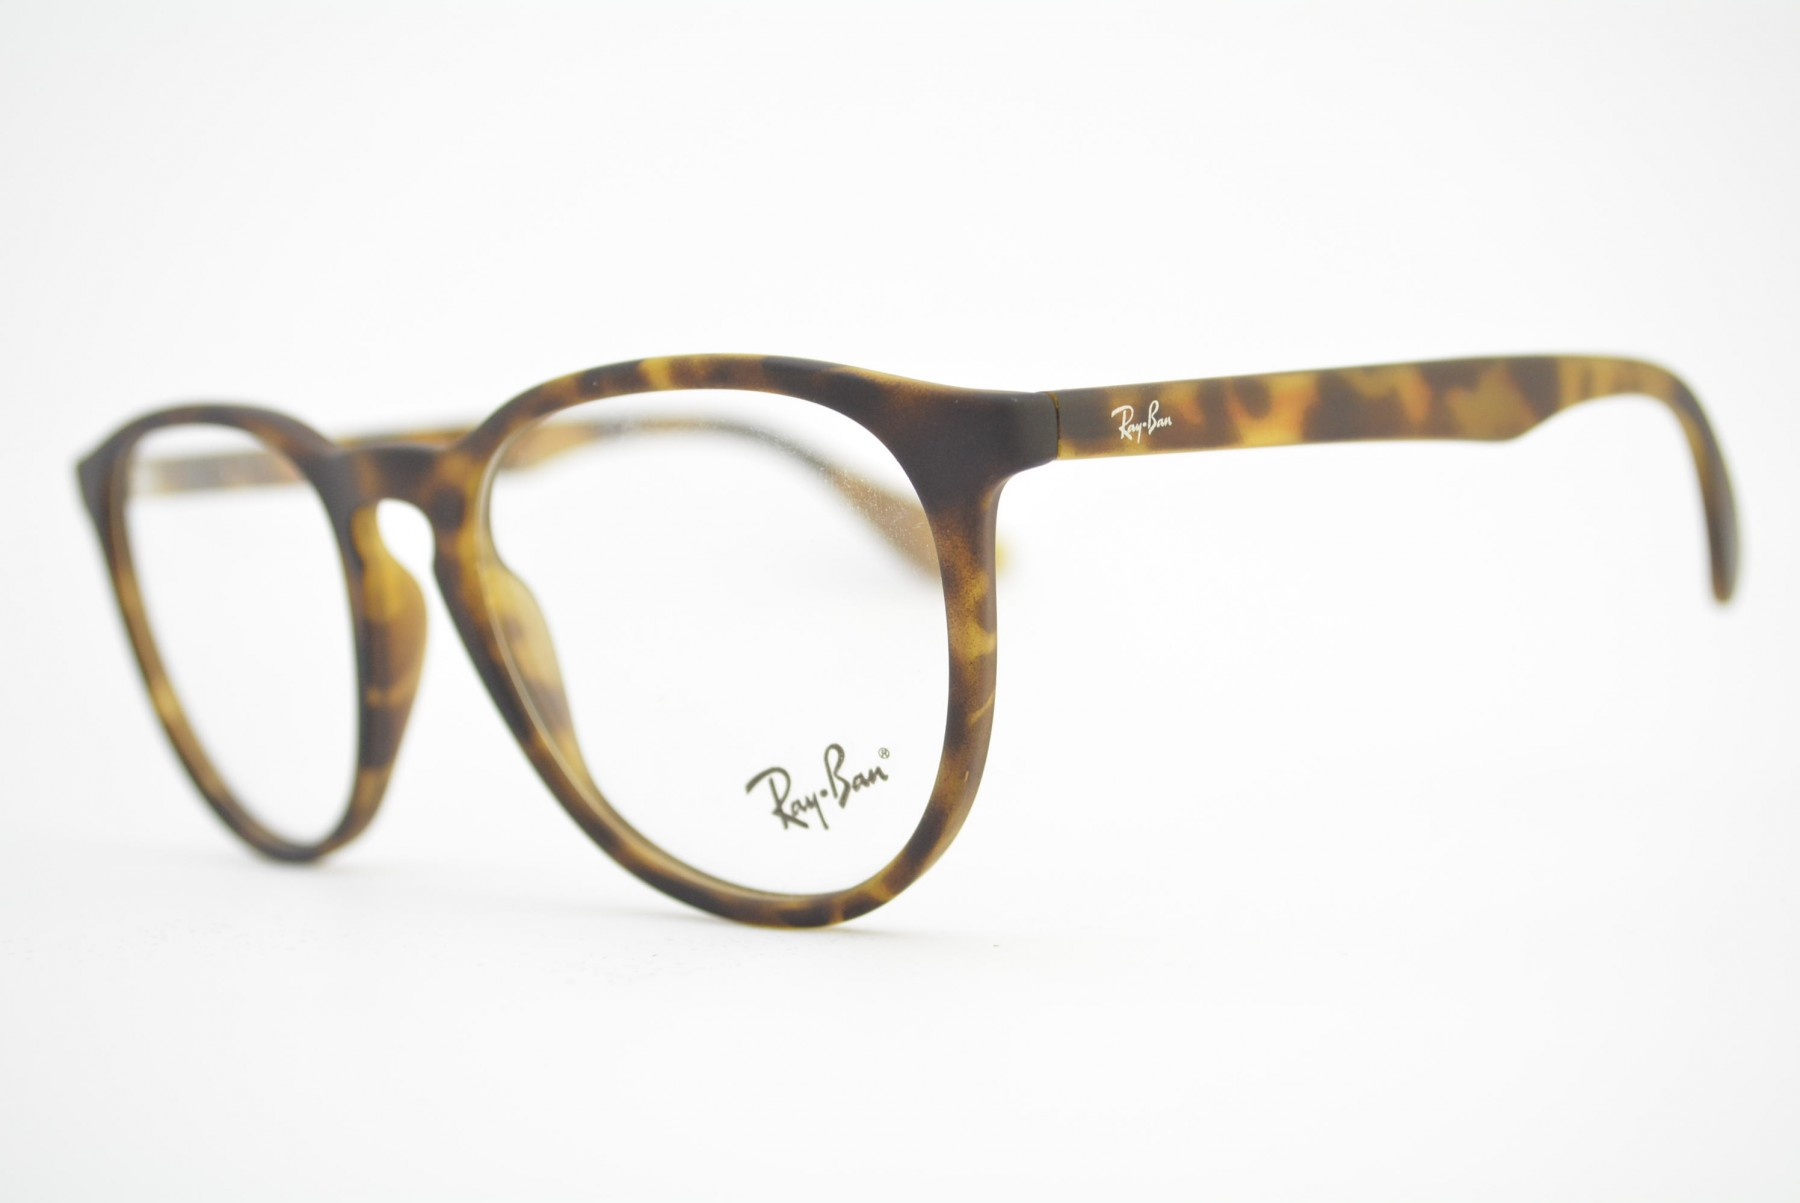 debca2bc0a093 armação de óculos Ray Ban Erika mod rb7046L 5365. Código  rb7046l 5365